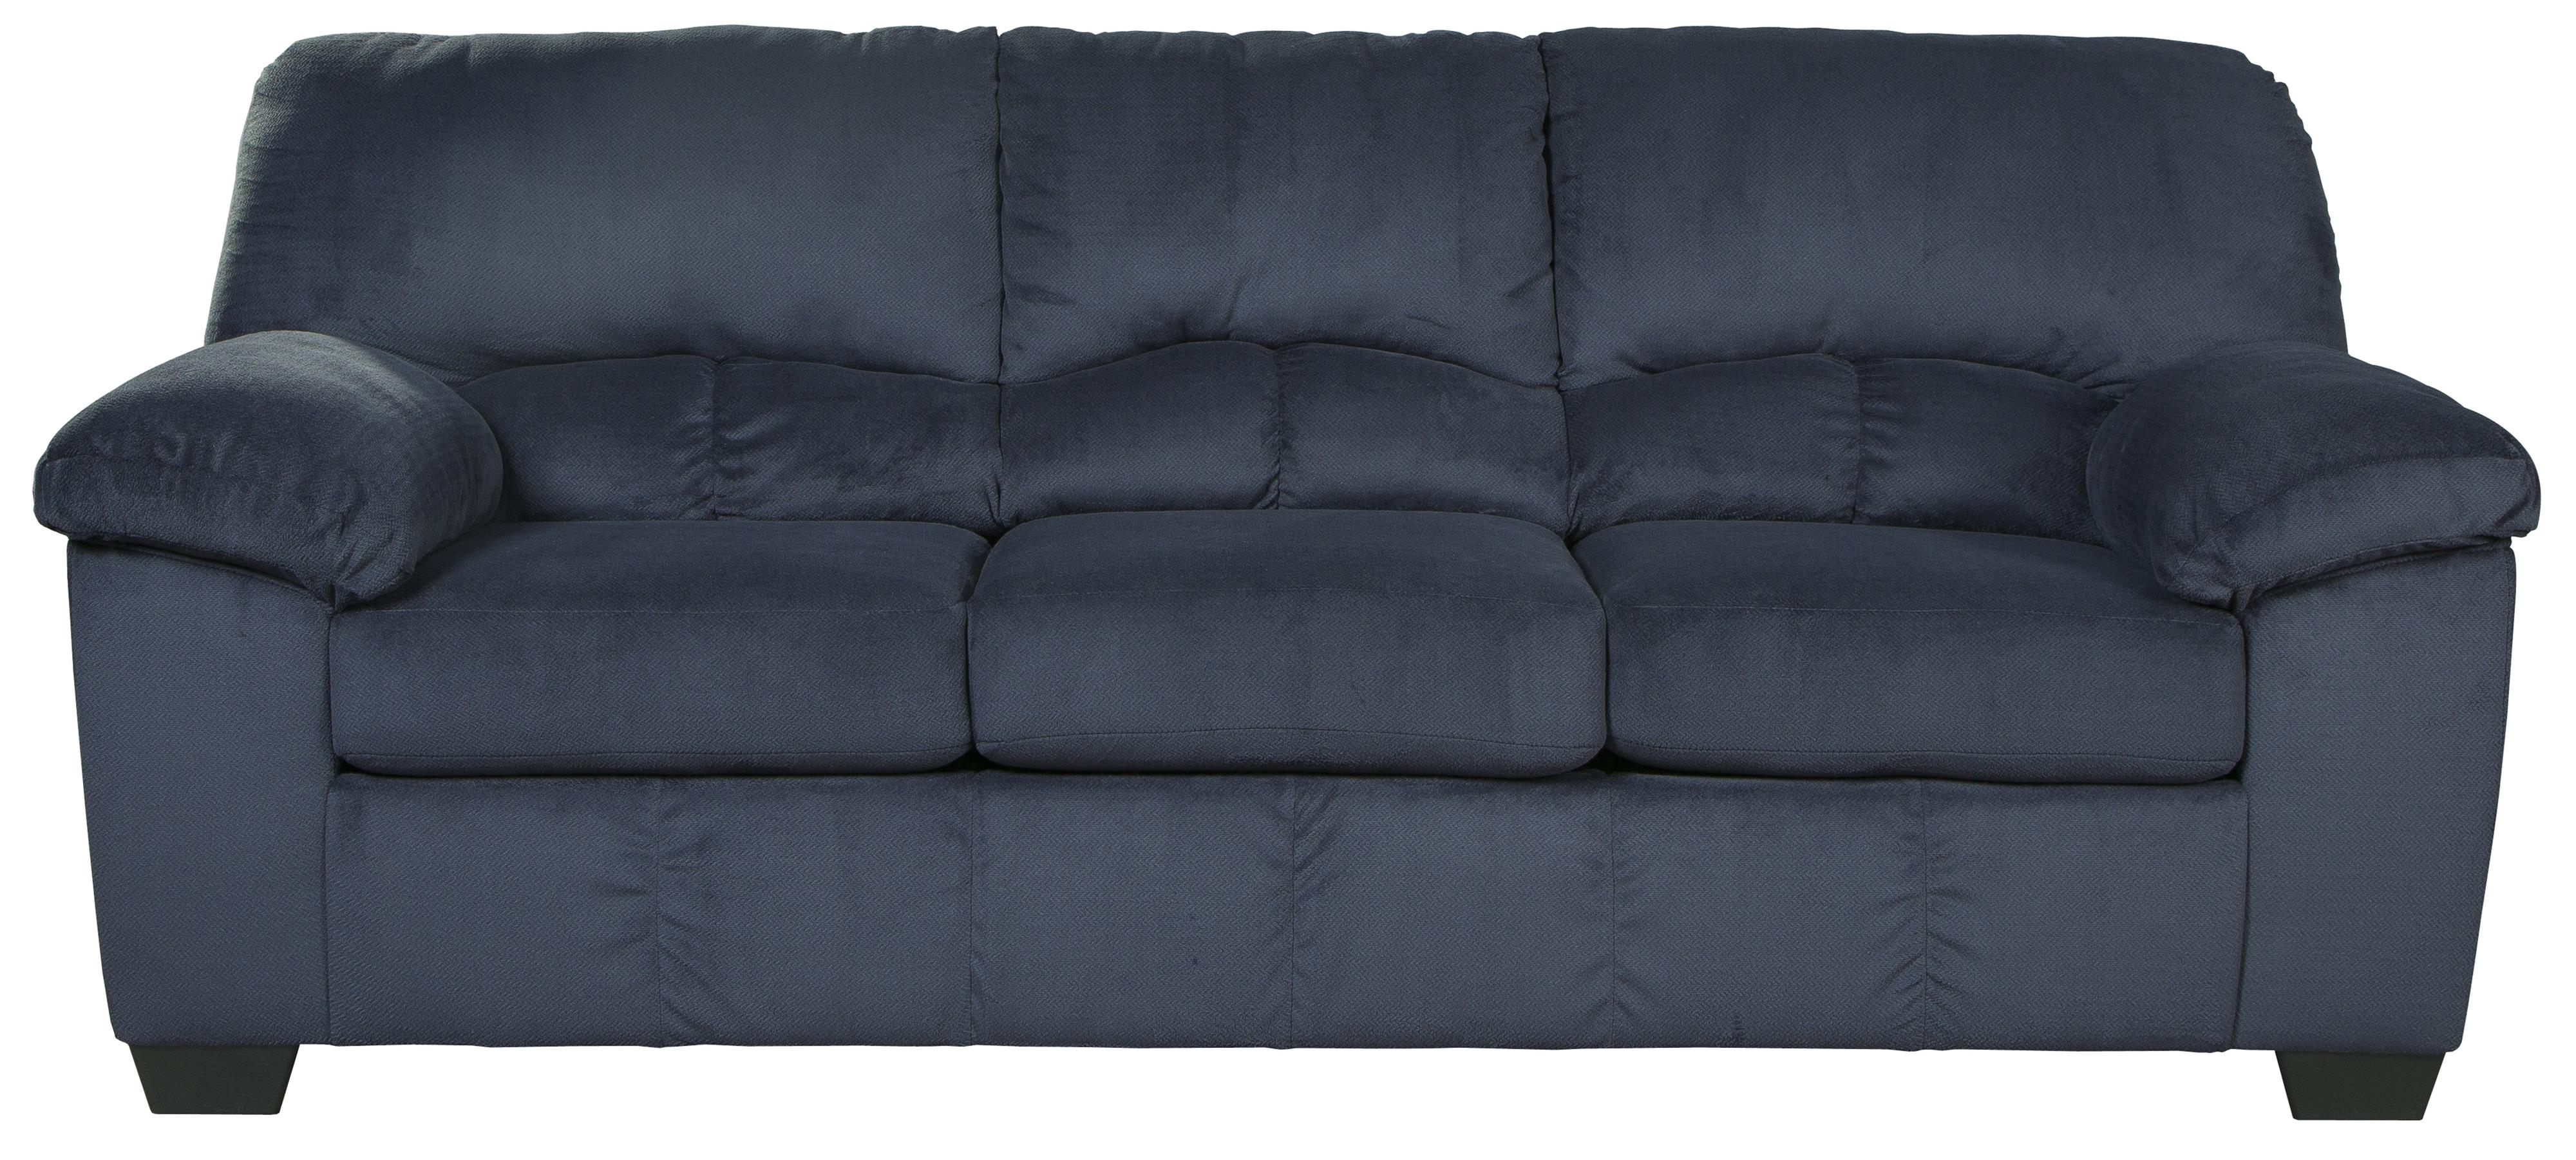 Signature Design By Ashley Dailey Casual Contemporary Sofa